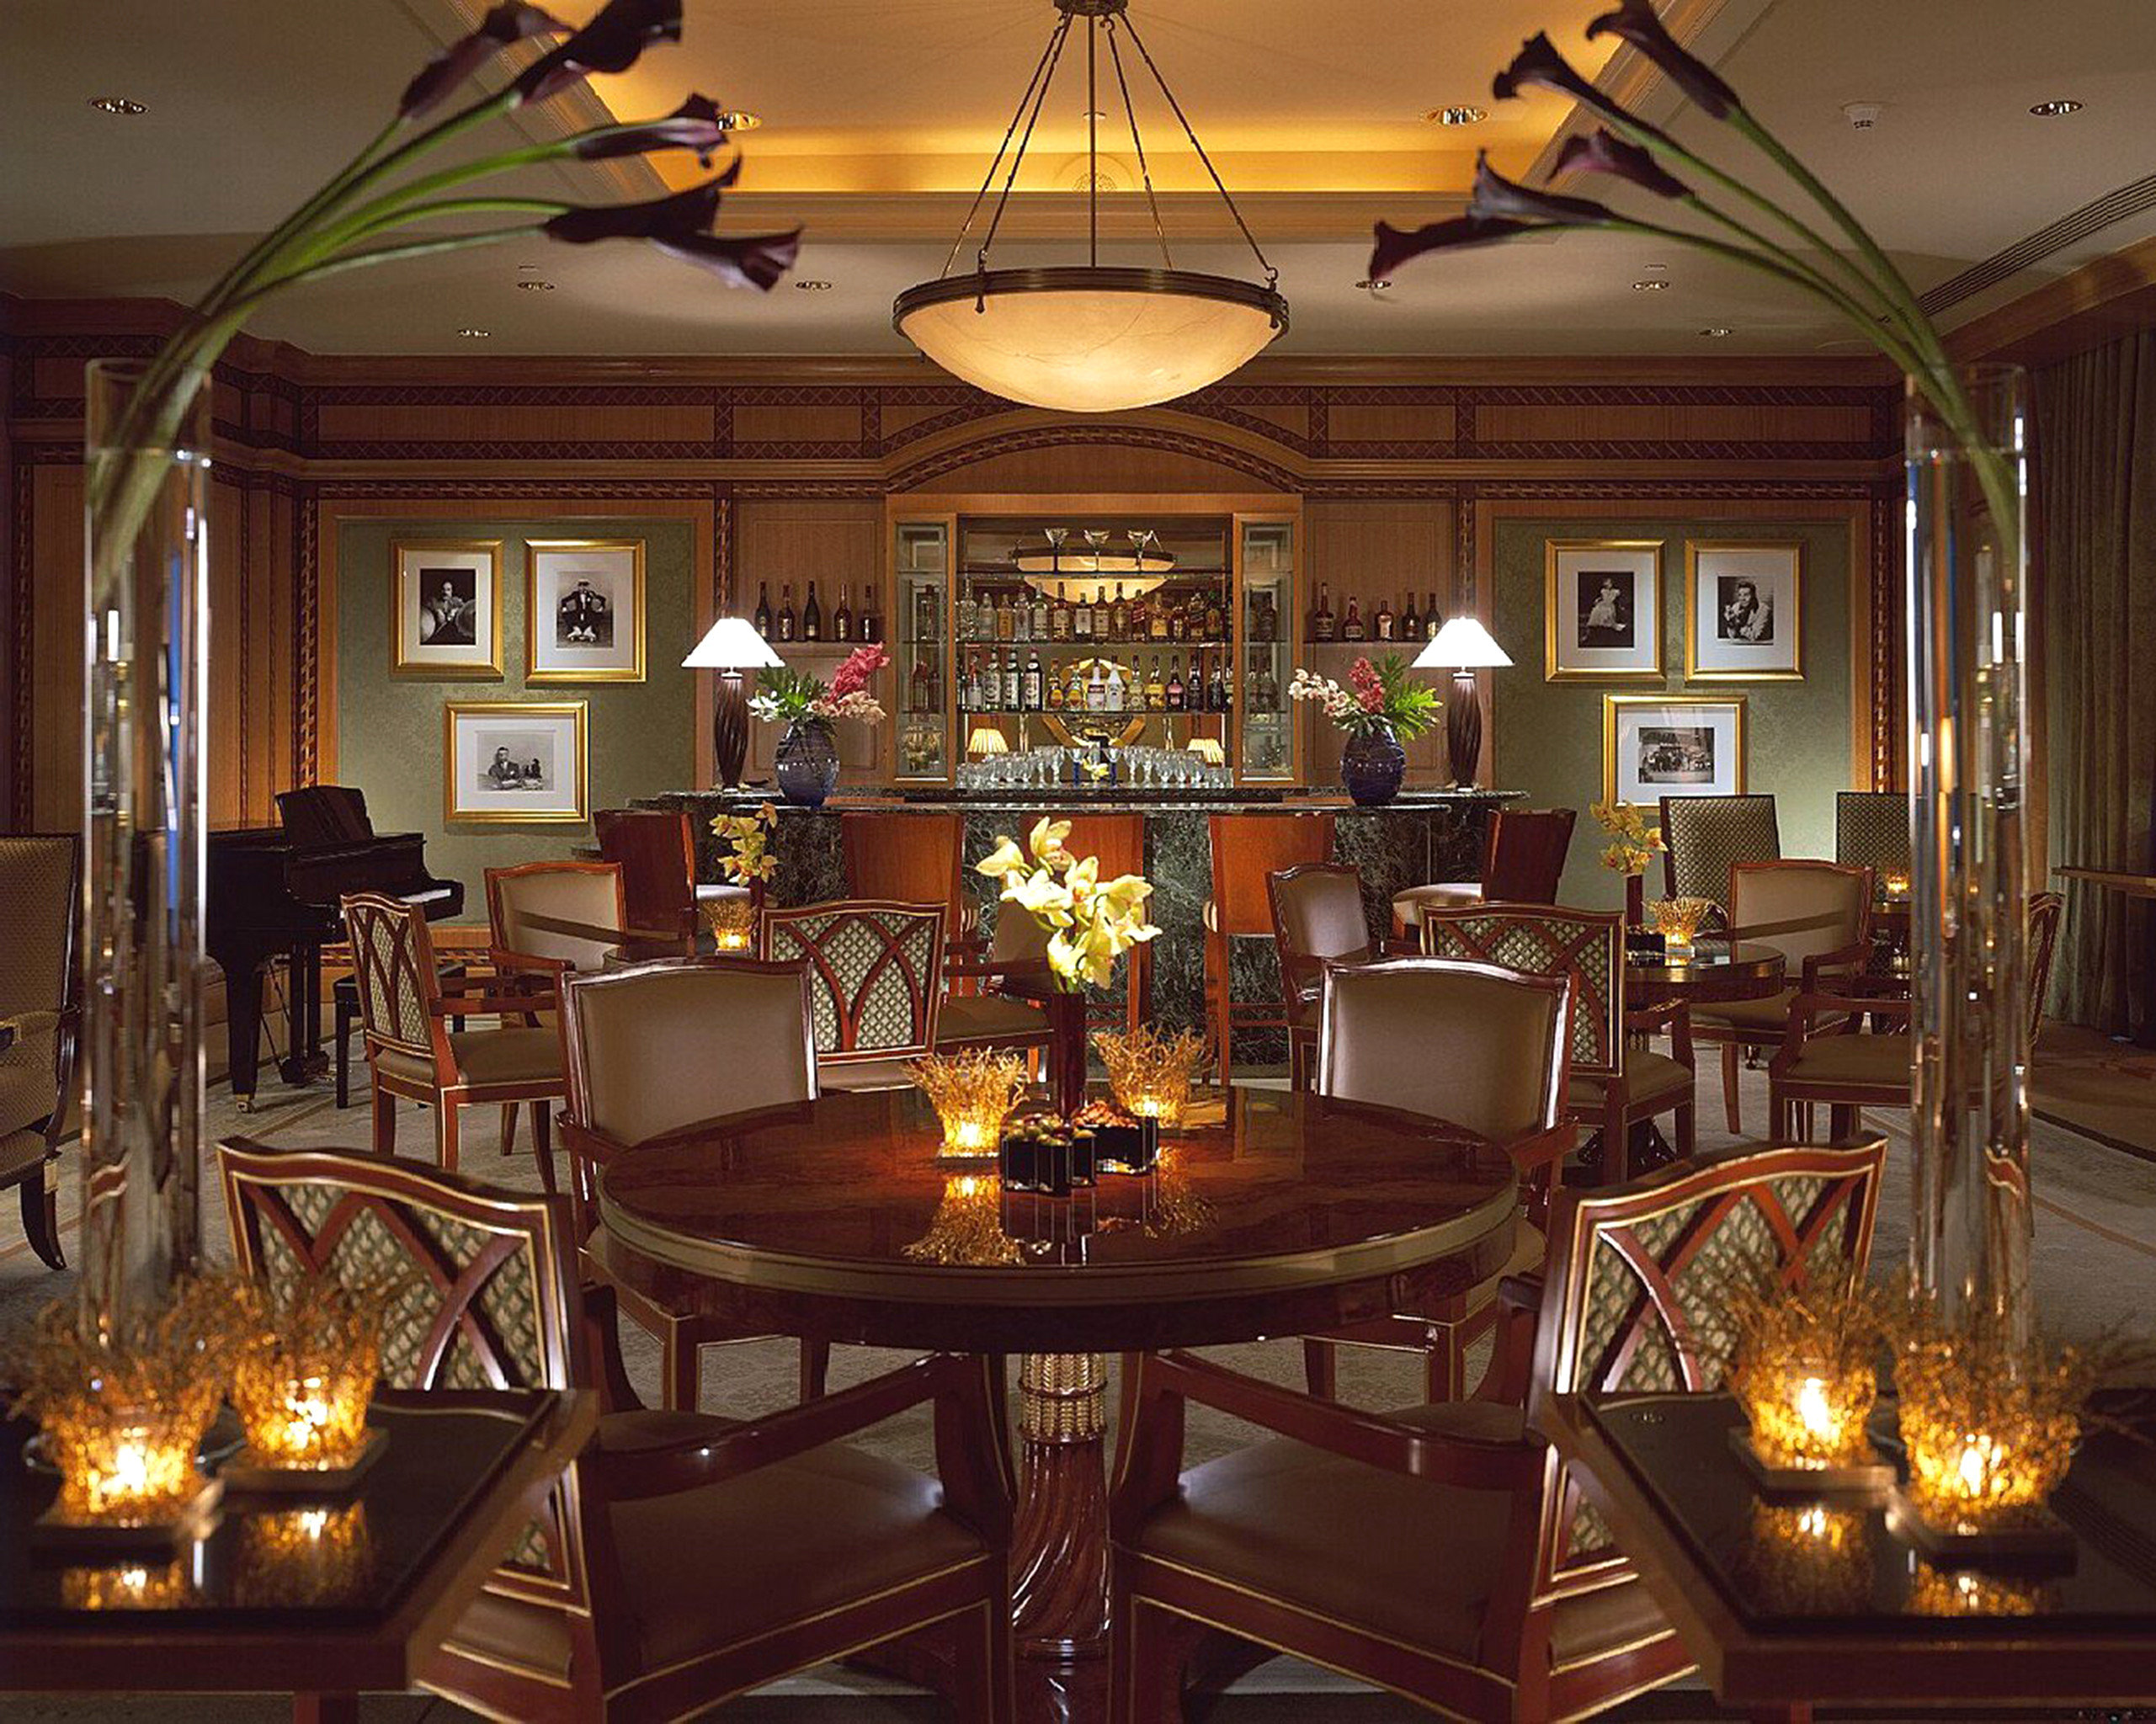 Dining Drink Eat Elegant Modern restaurant Bar lit recreation room mansion function hall dining table